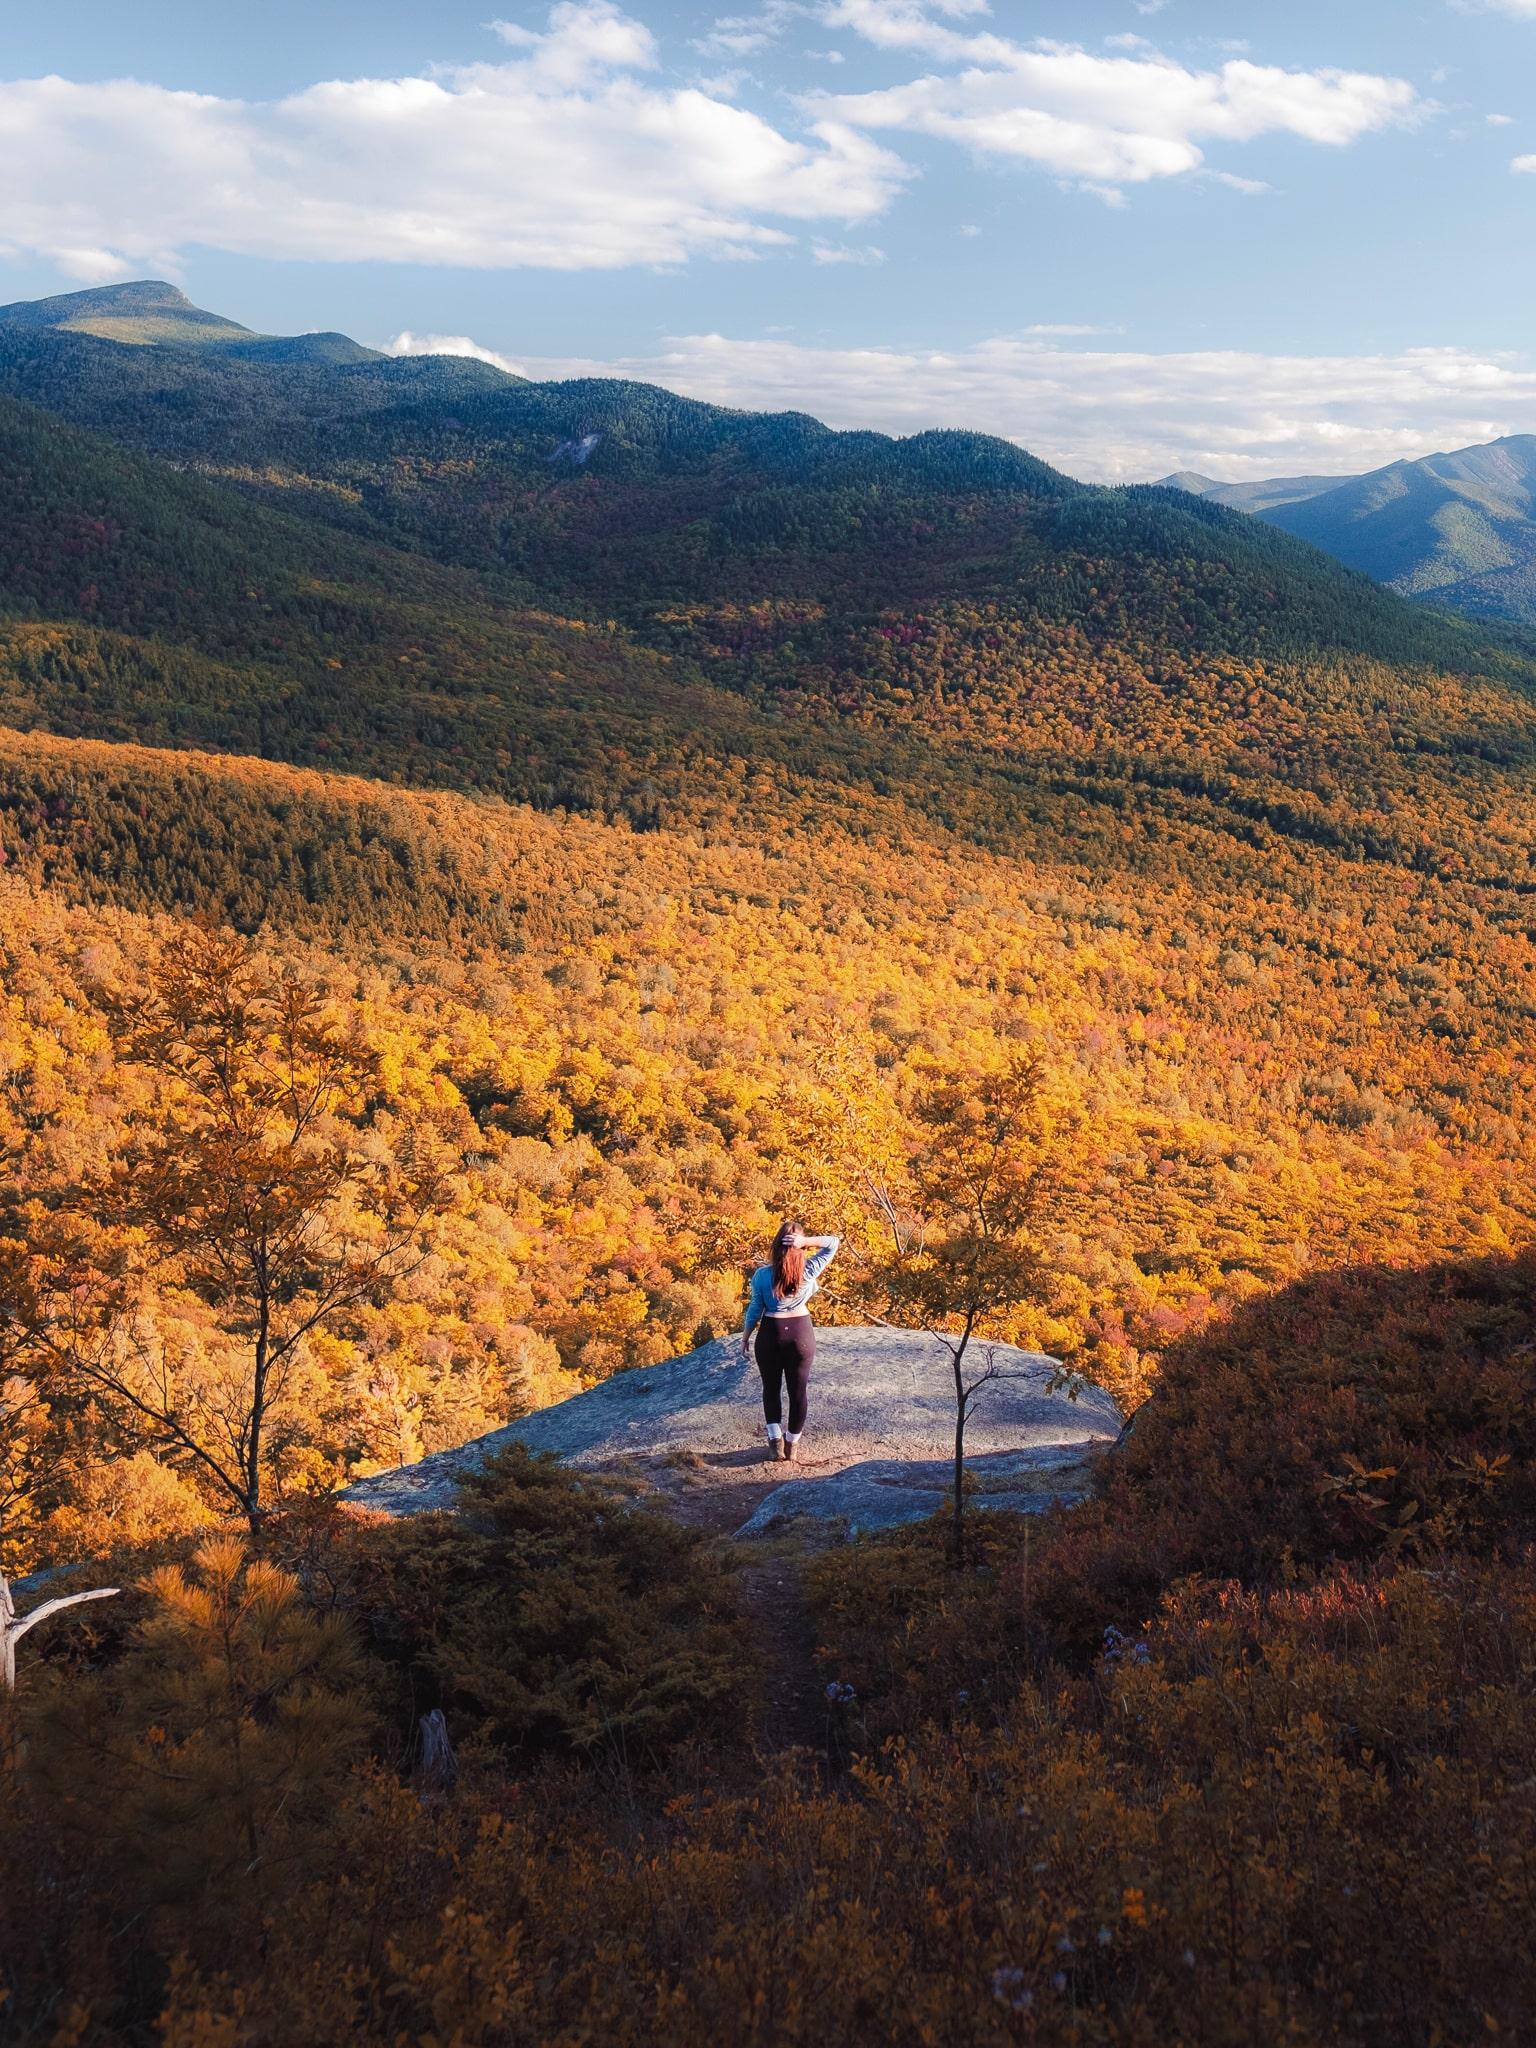 Hiking during fall in the Adirondacks